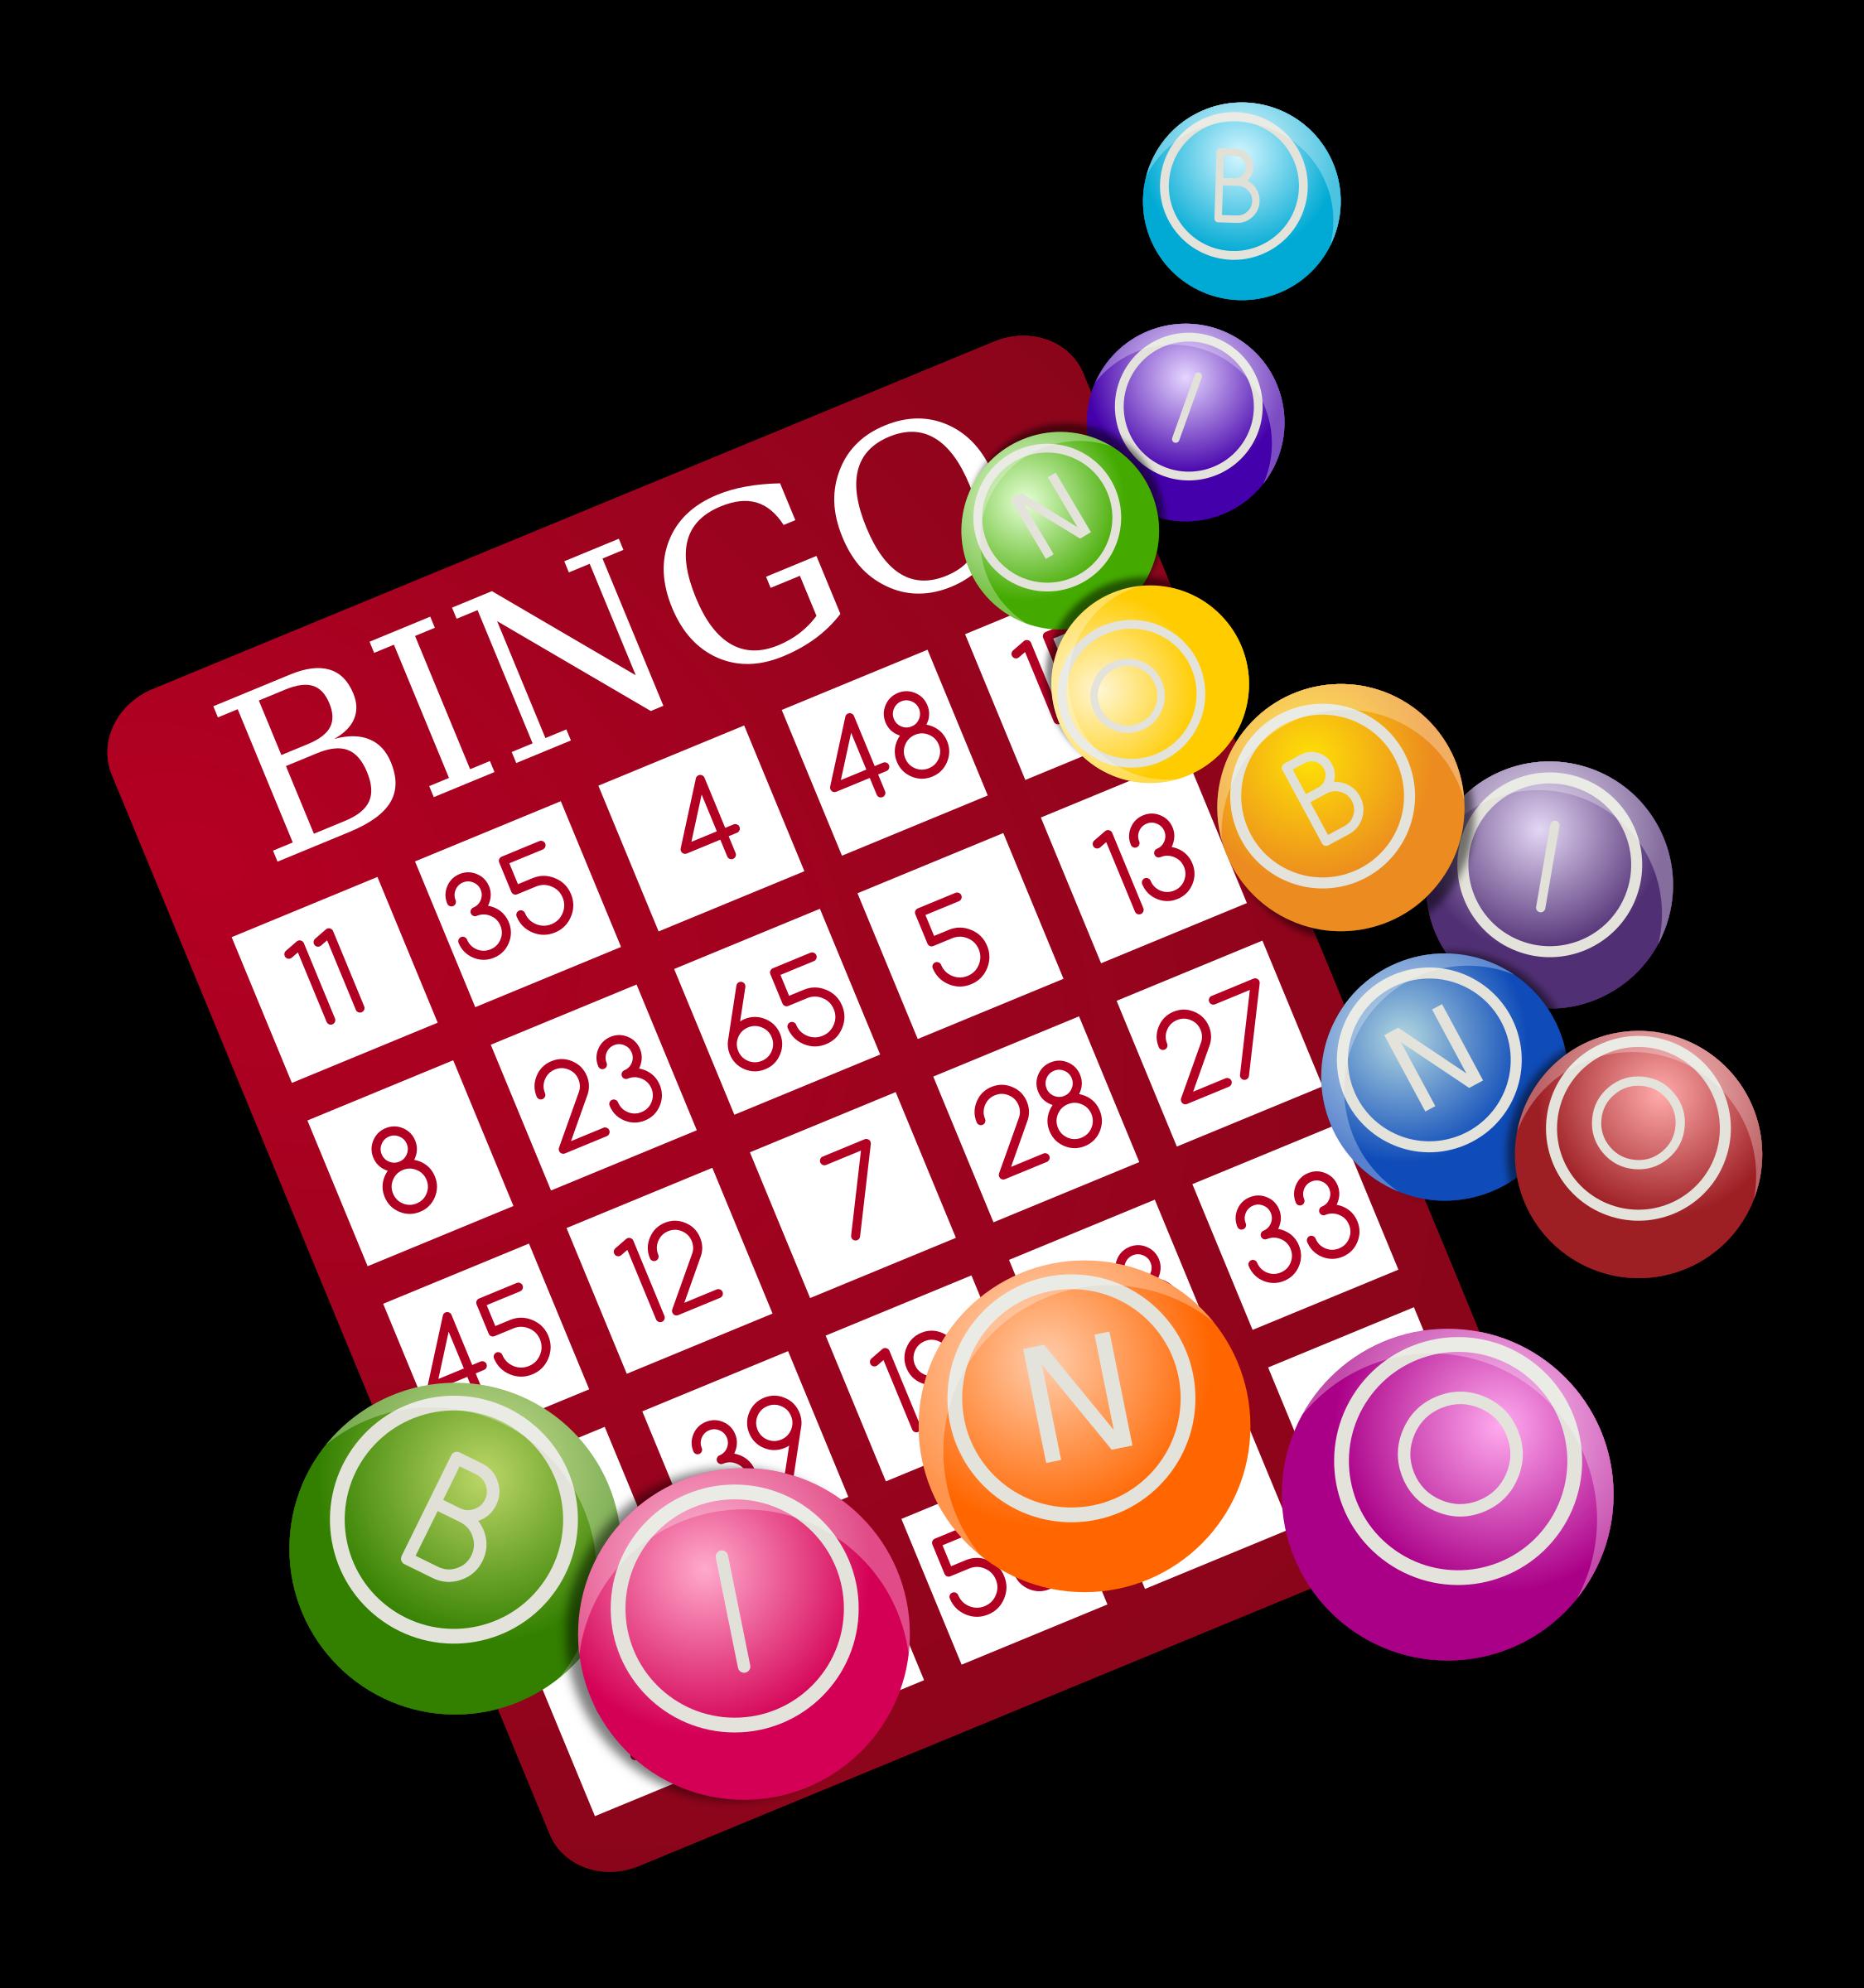 banner free Clipart big image png. Bingo vector card